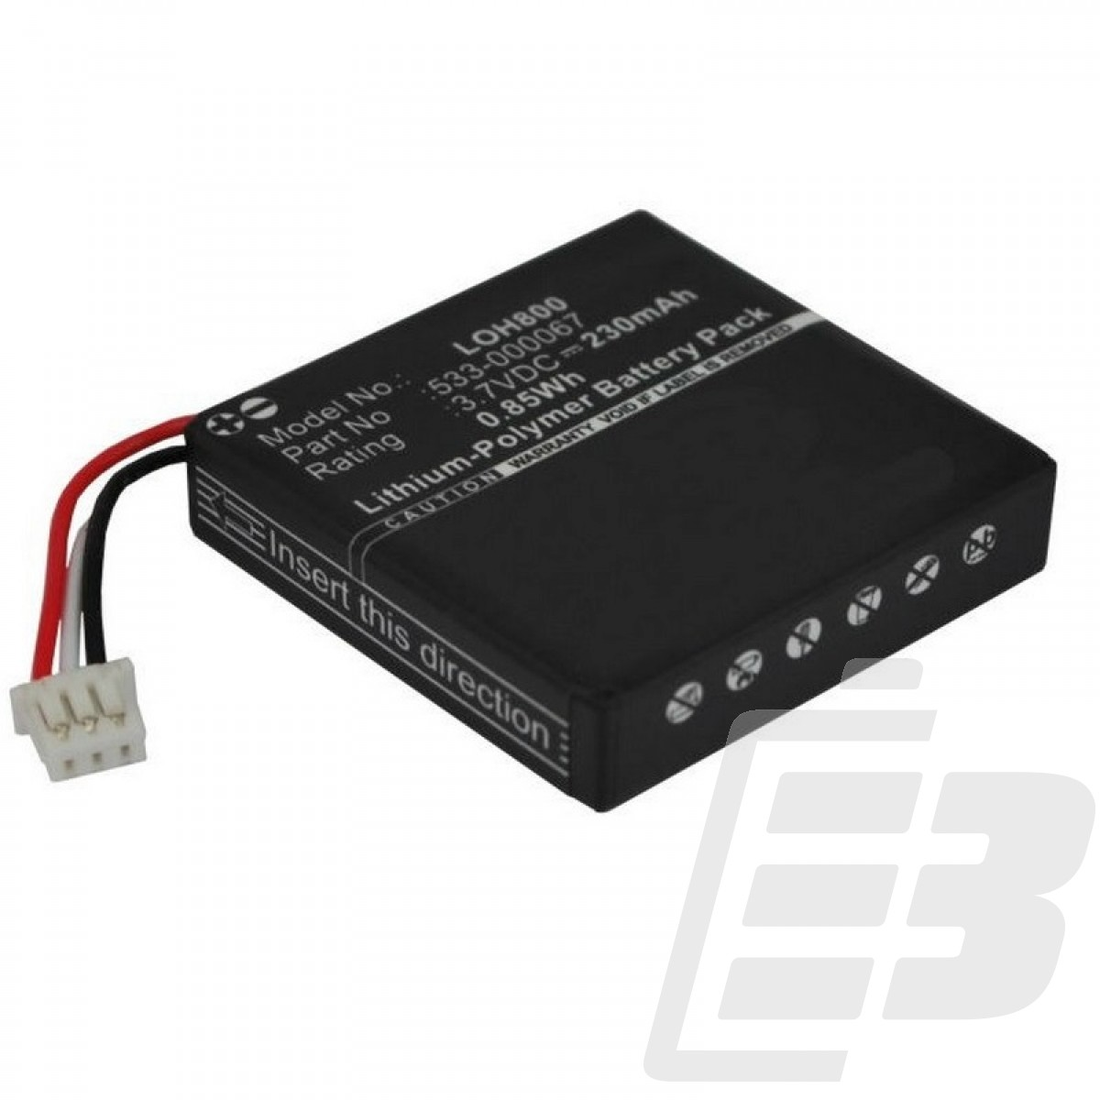 Wireless headset battery Logitech H800_1